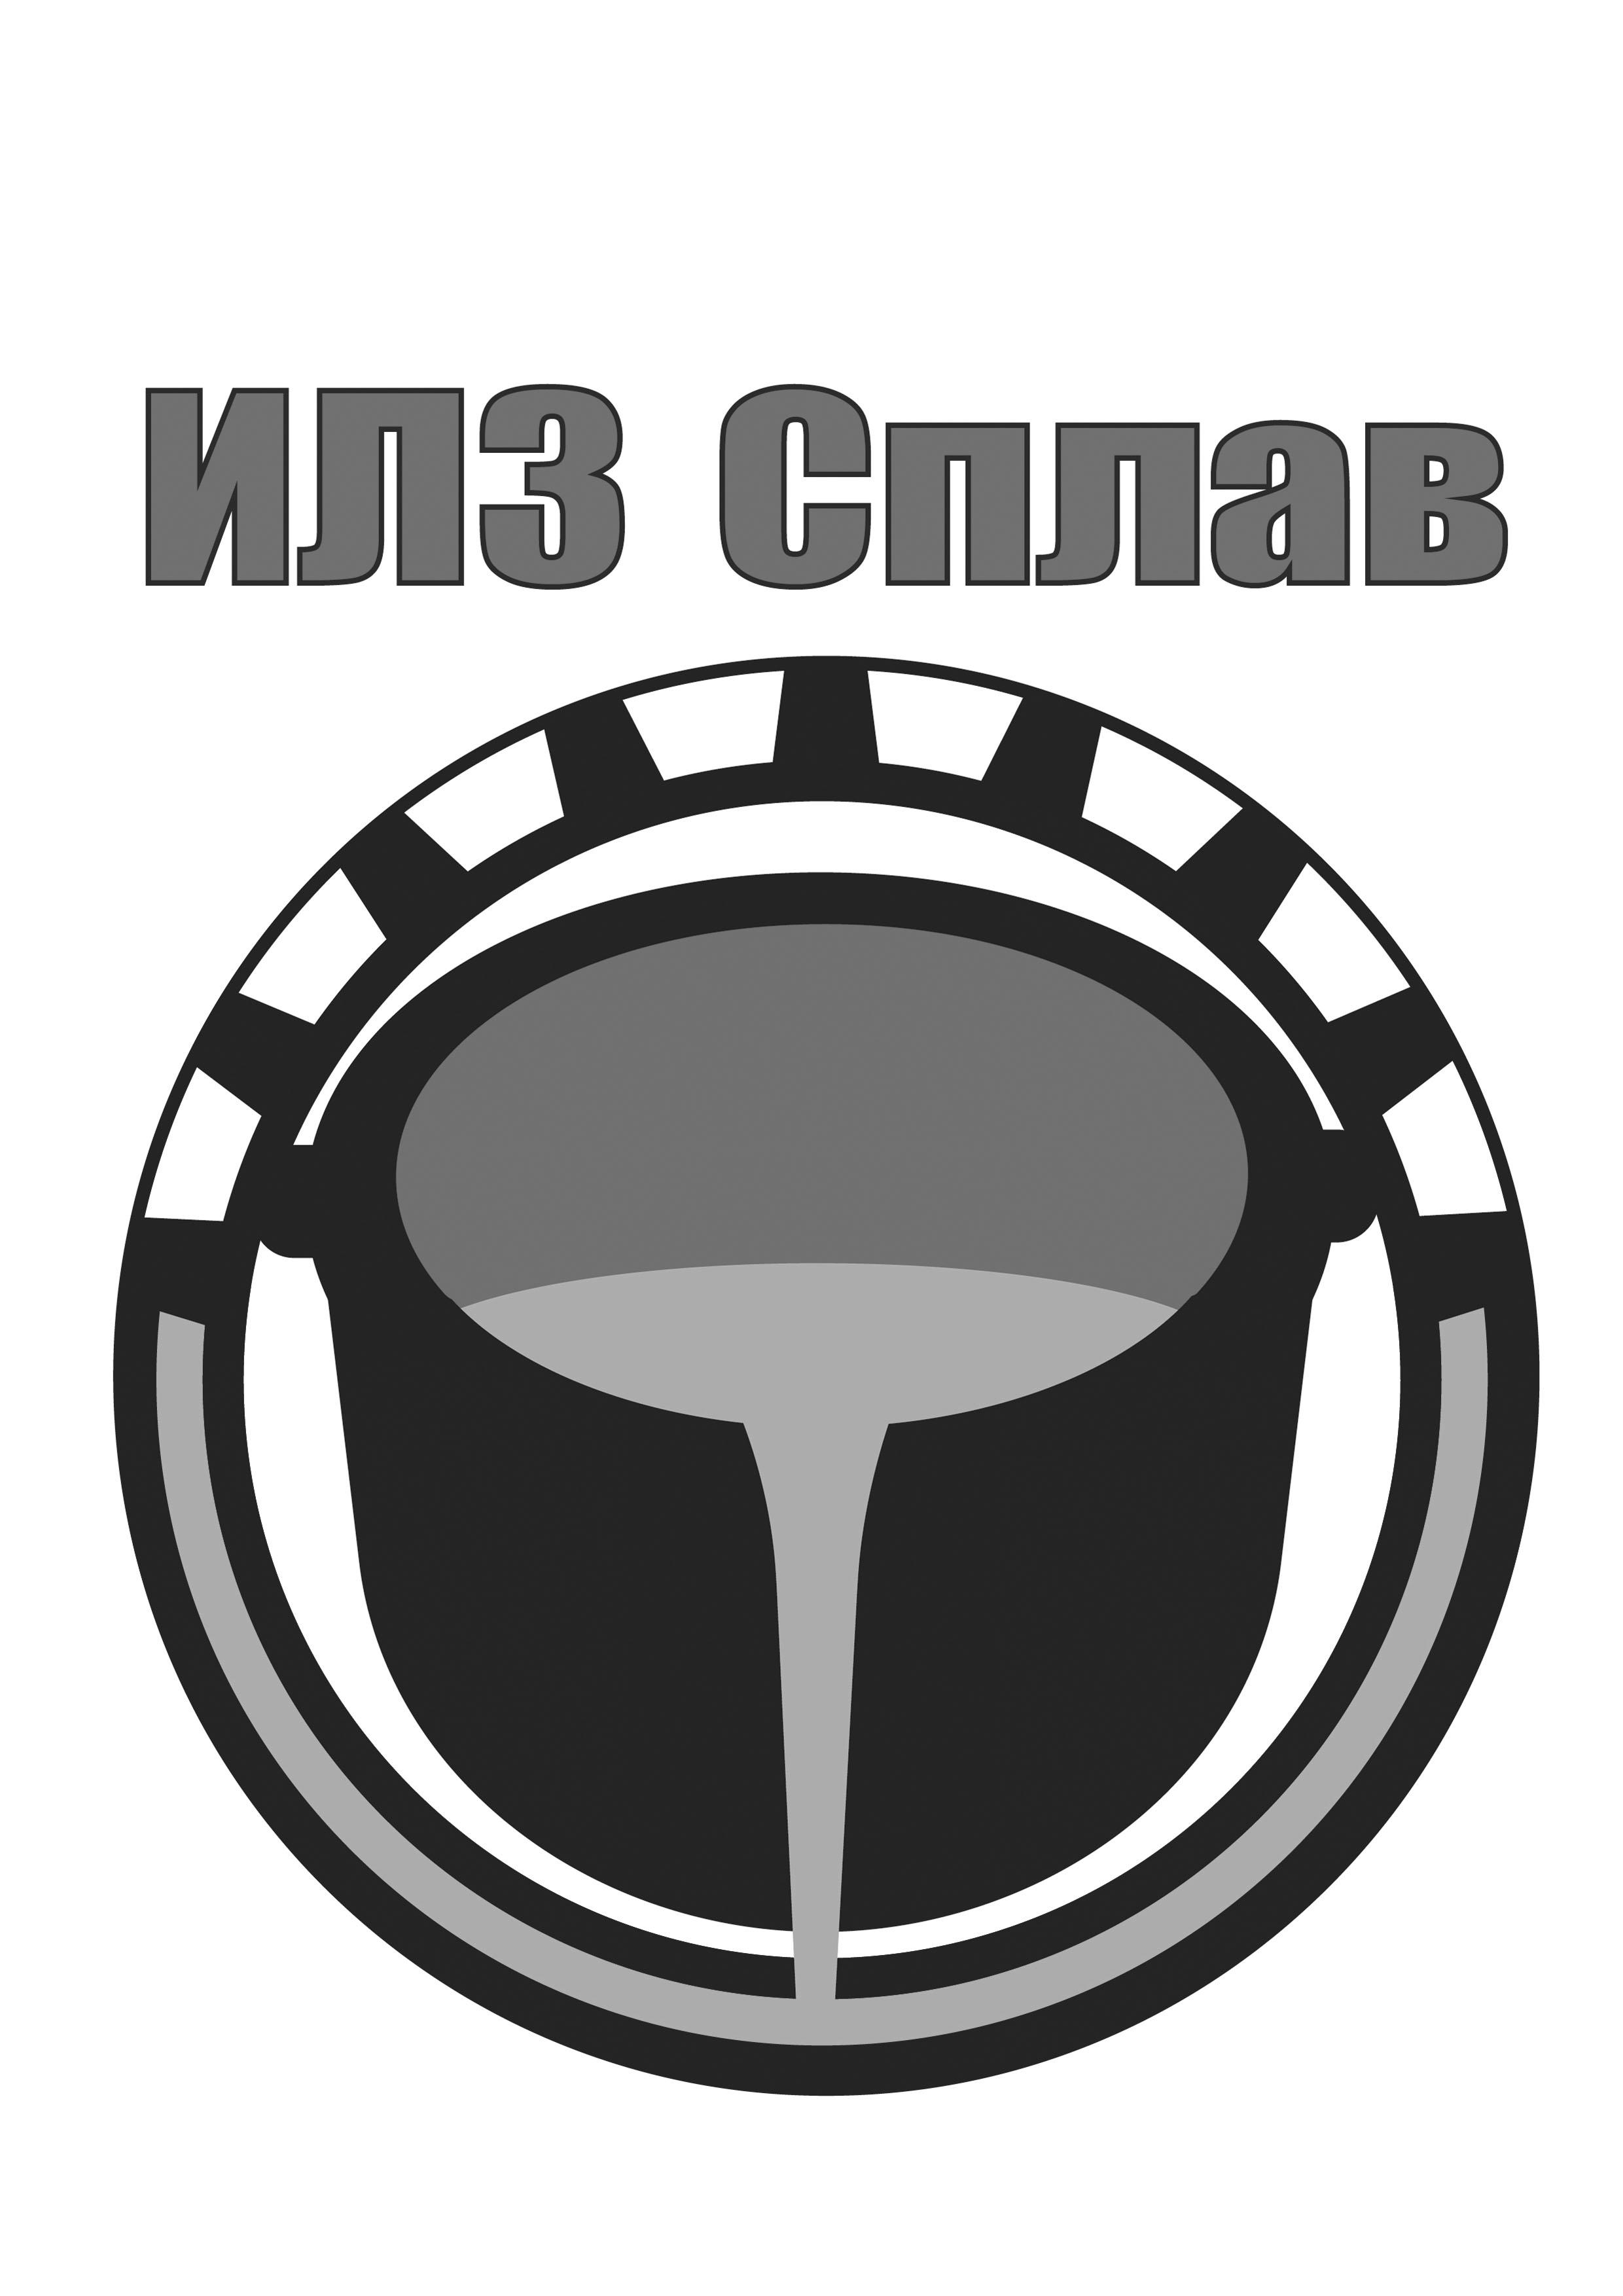 Разработать логотип для литейного завода фото f_1735b159807234e2.jpg